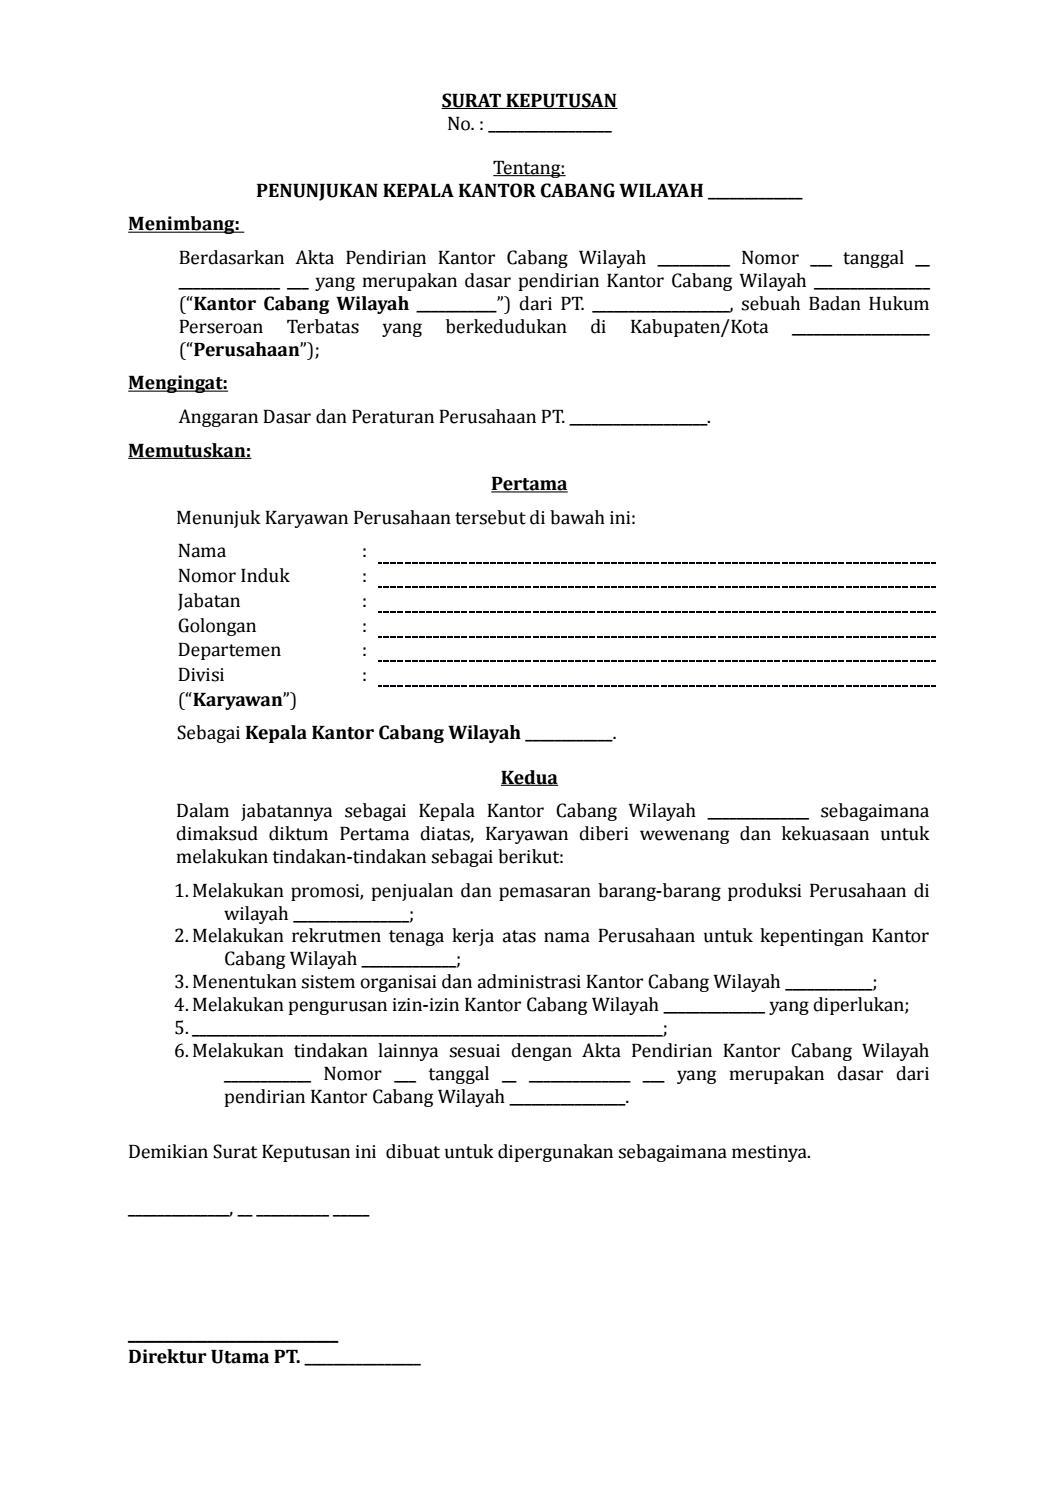 09 Draf Surat Keputusan Penunjukan Kepala Kantor Cabang By